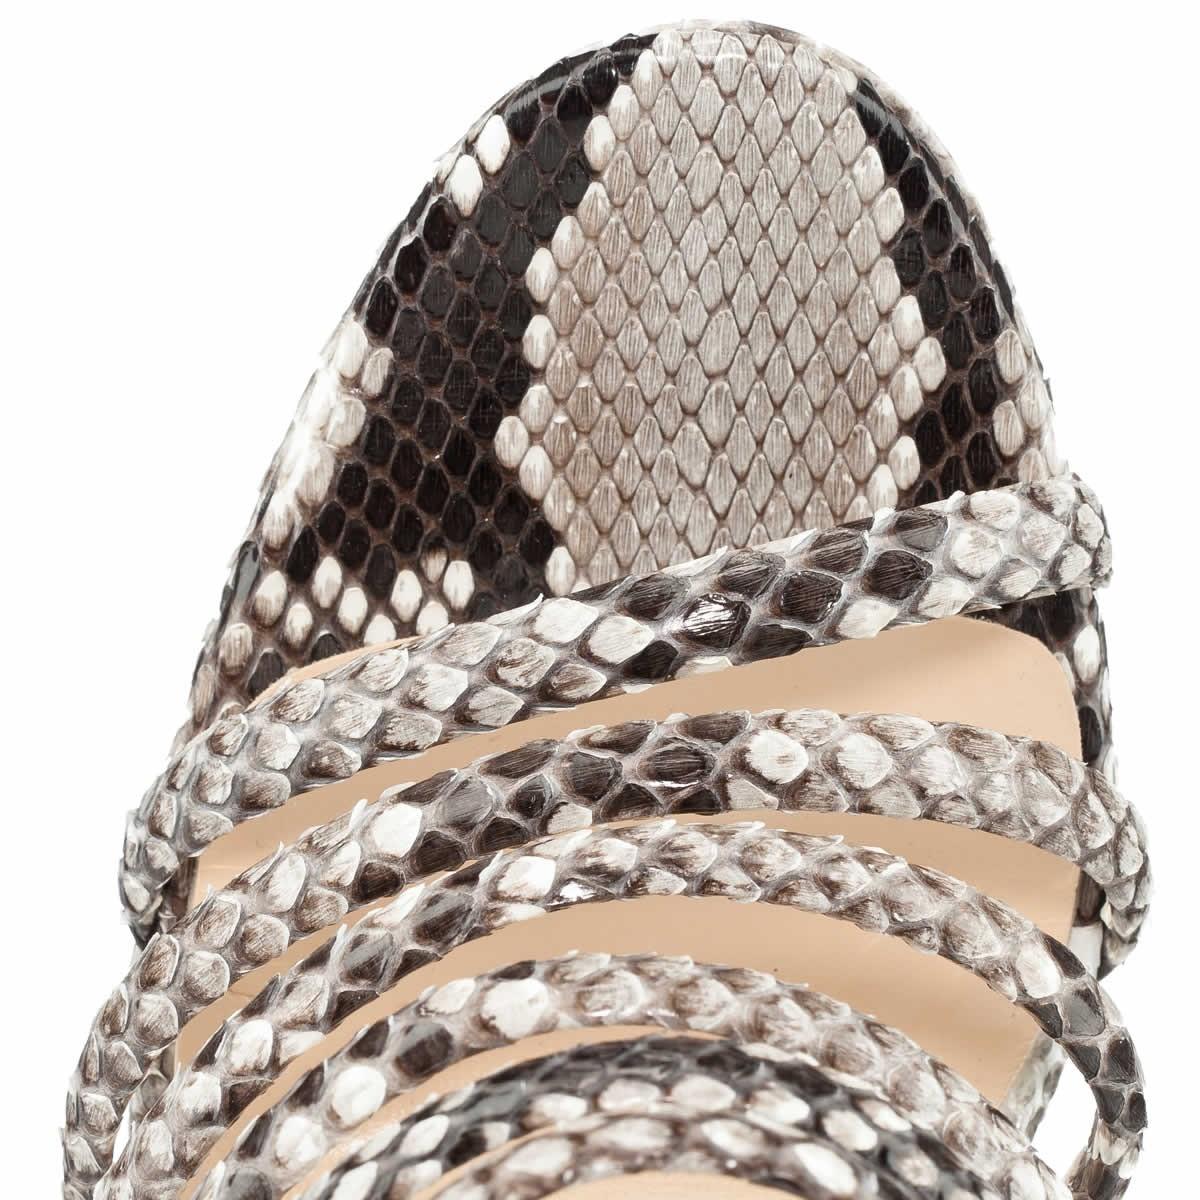 ... Christian Louboutin Vildo 140mm Sandals Roccia ...